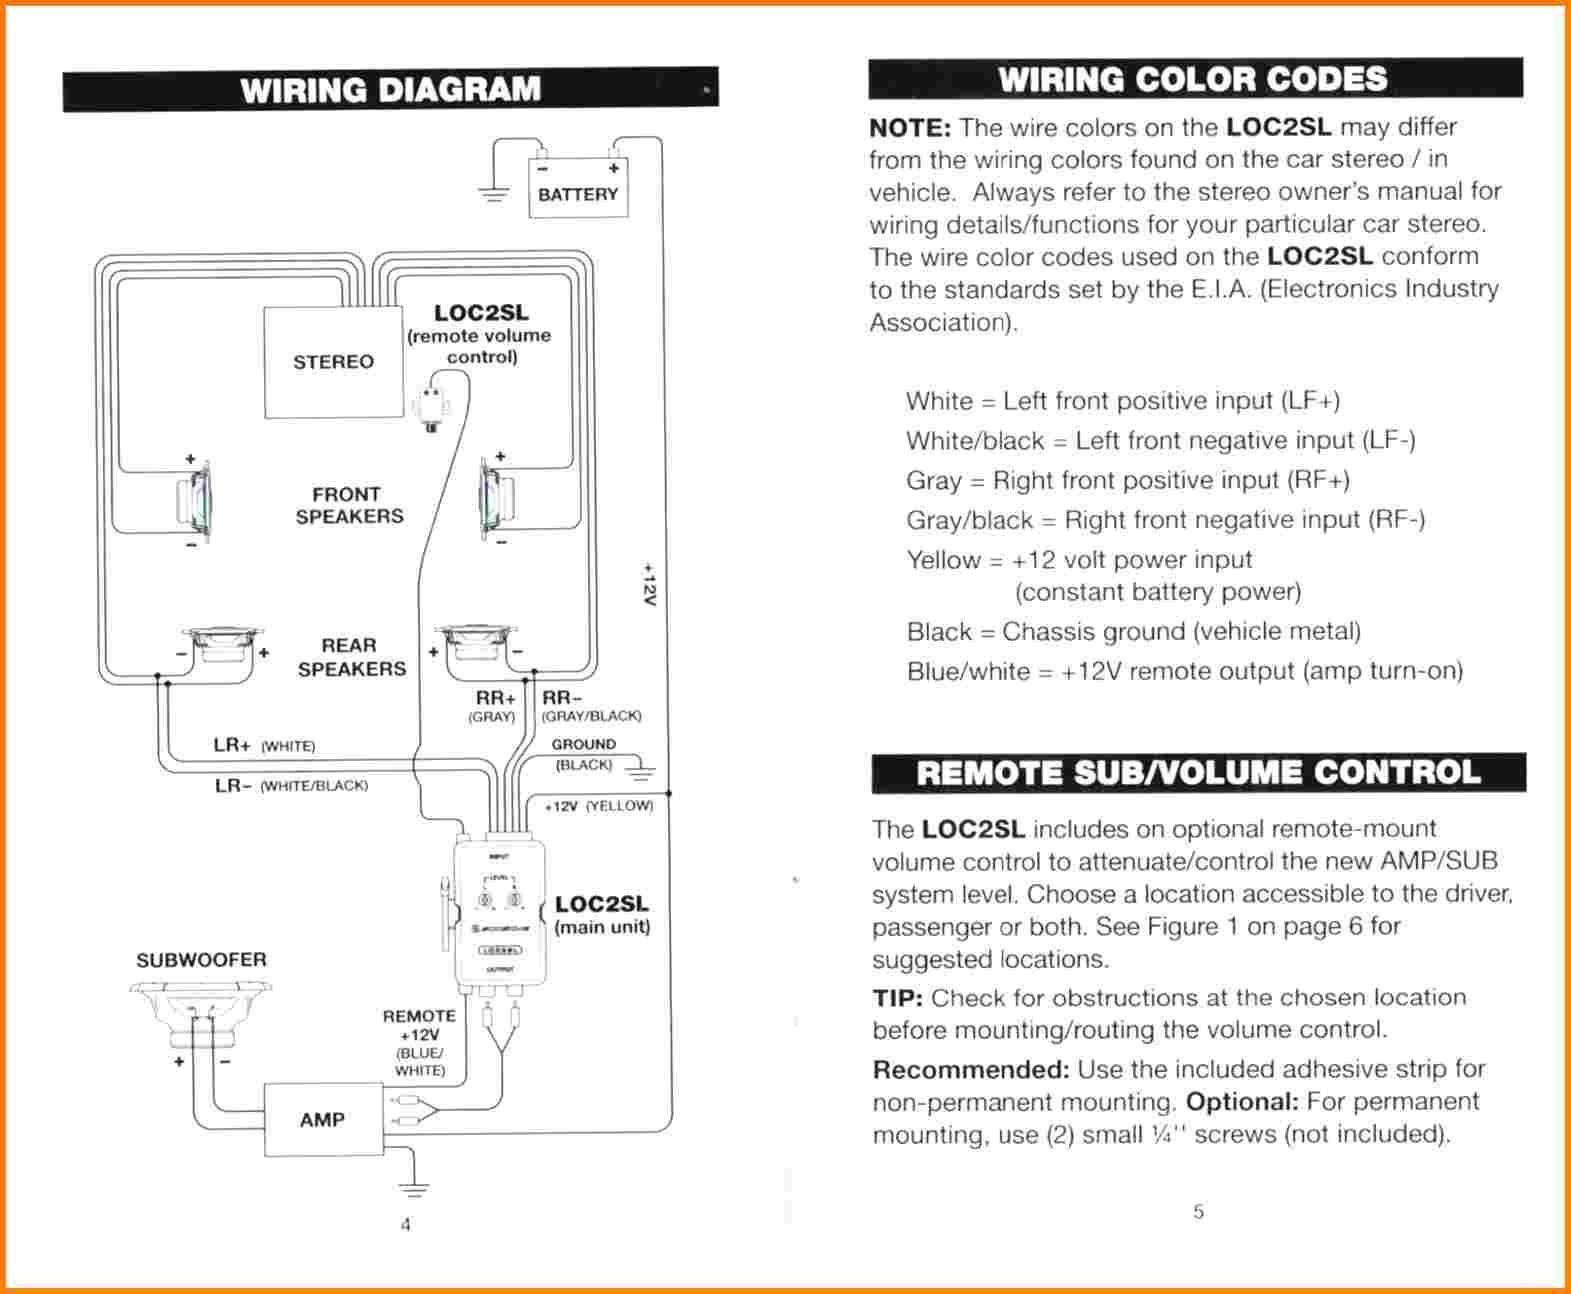 Scosche Line Out Converter Wiring Diagram | Wiring Diagram - Scosche Line Out Converter Wiring Diagram